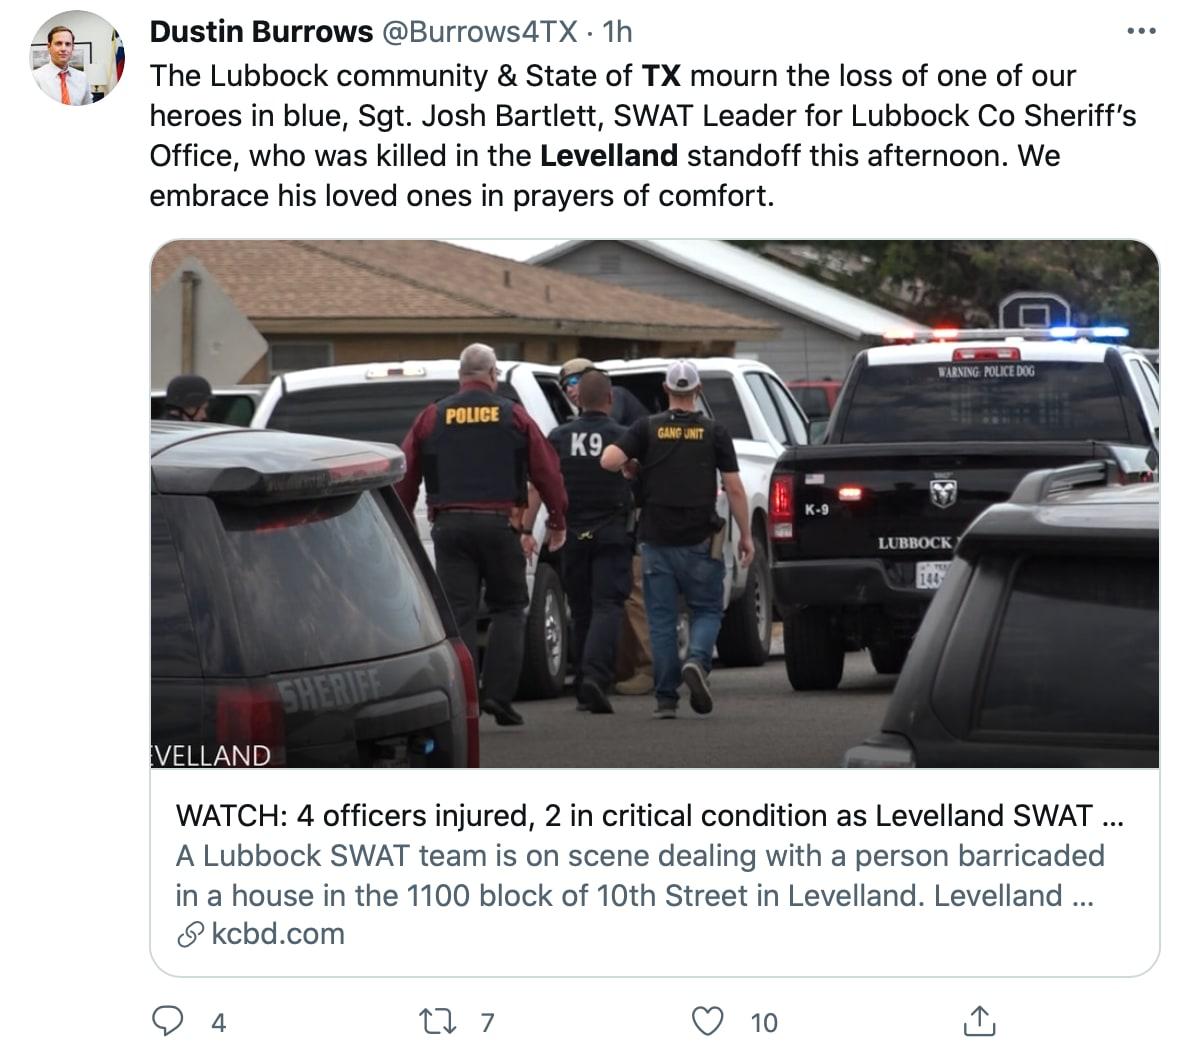 Levelland Shooting: A New Texas Mass Shooting